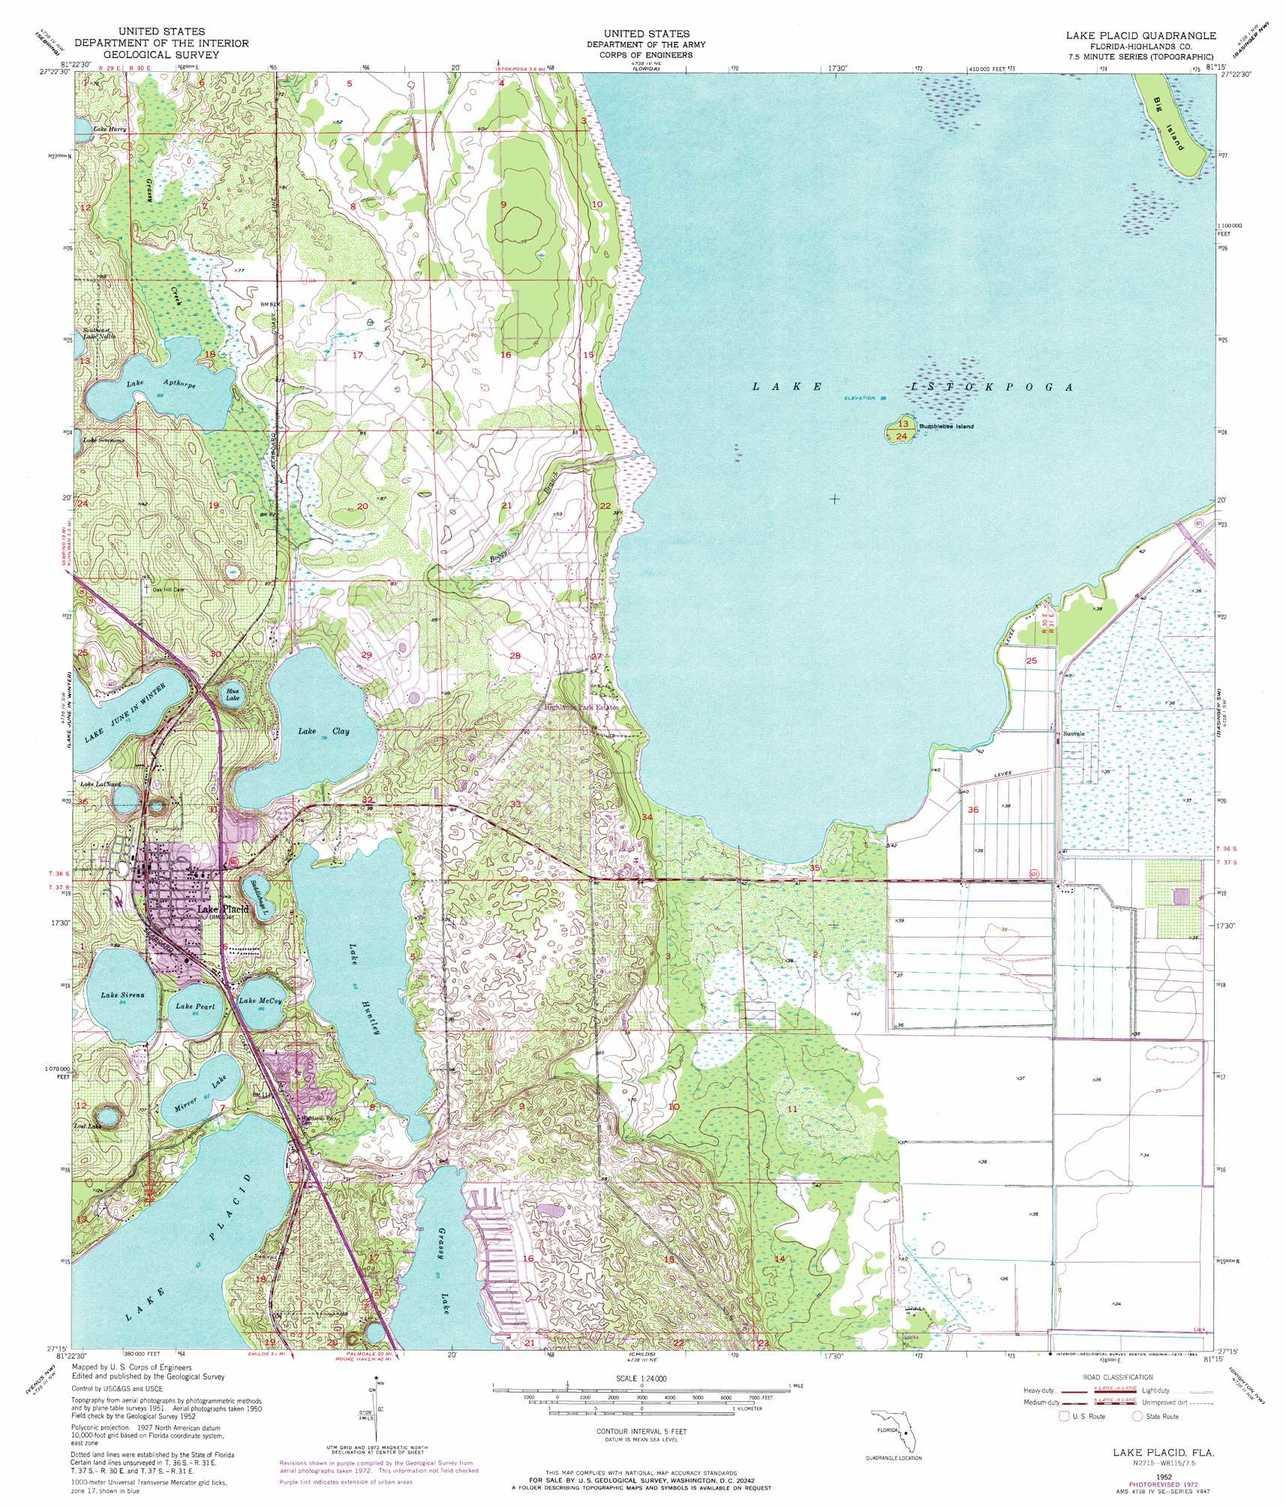 Lake Placid Topographic Map, Fl - Usgs Topo Quad 27081C3 - Lake Placid Florida Map